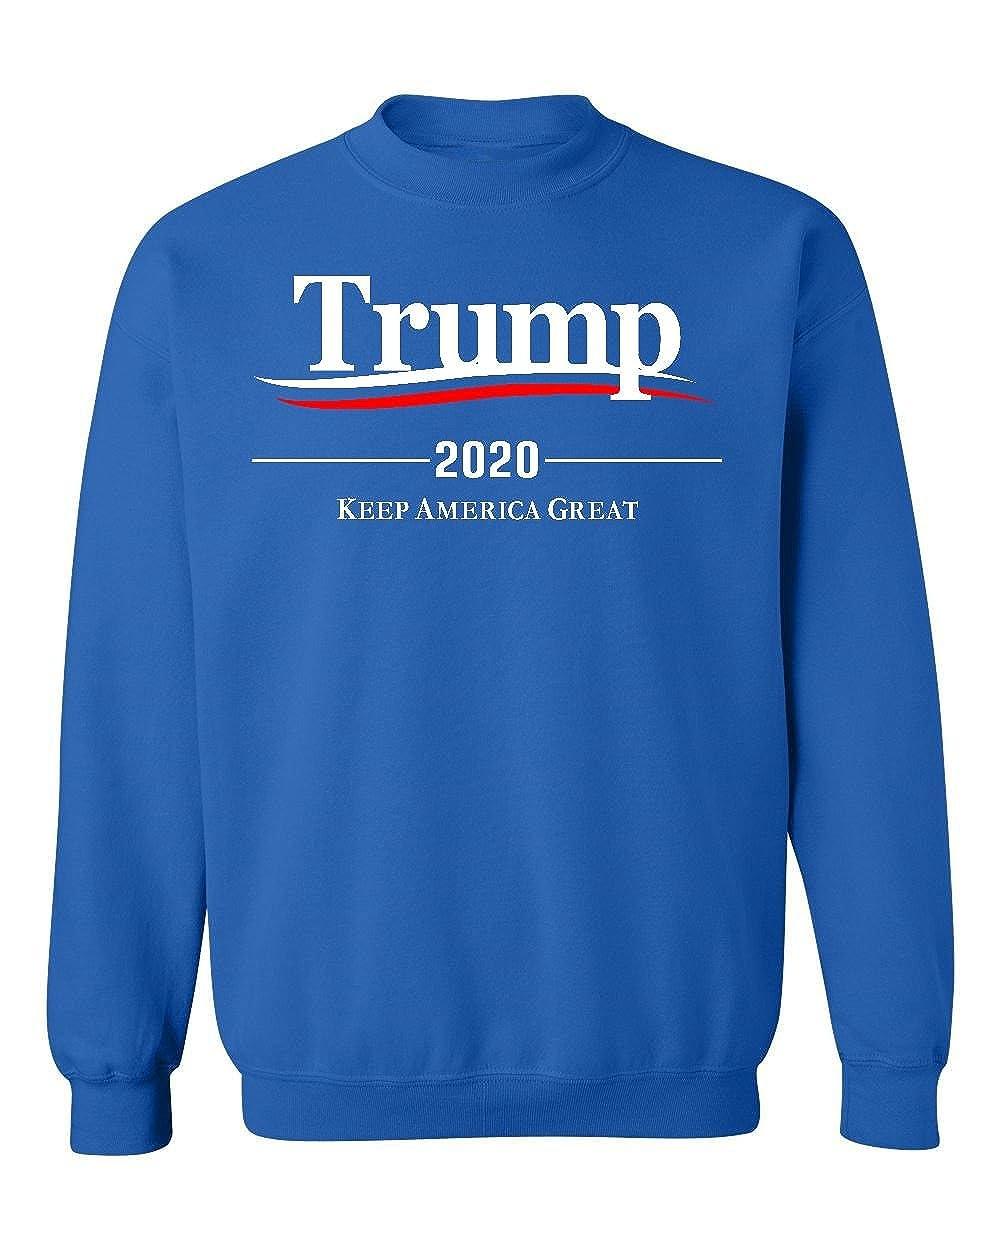 Promotion /& Beyond Trump 2020 Keep America Great Wavy Crewneck Sweatshirt